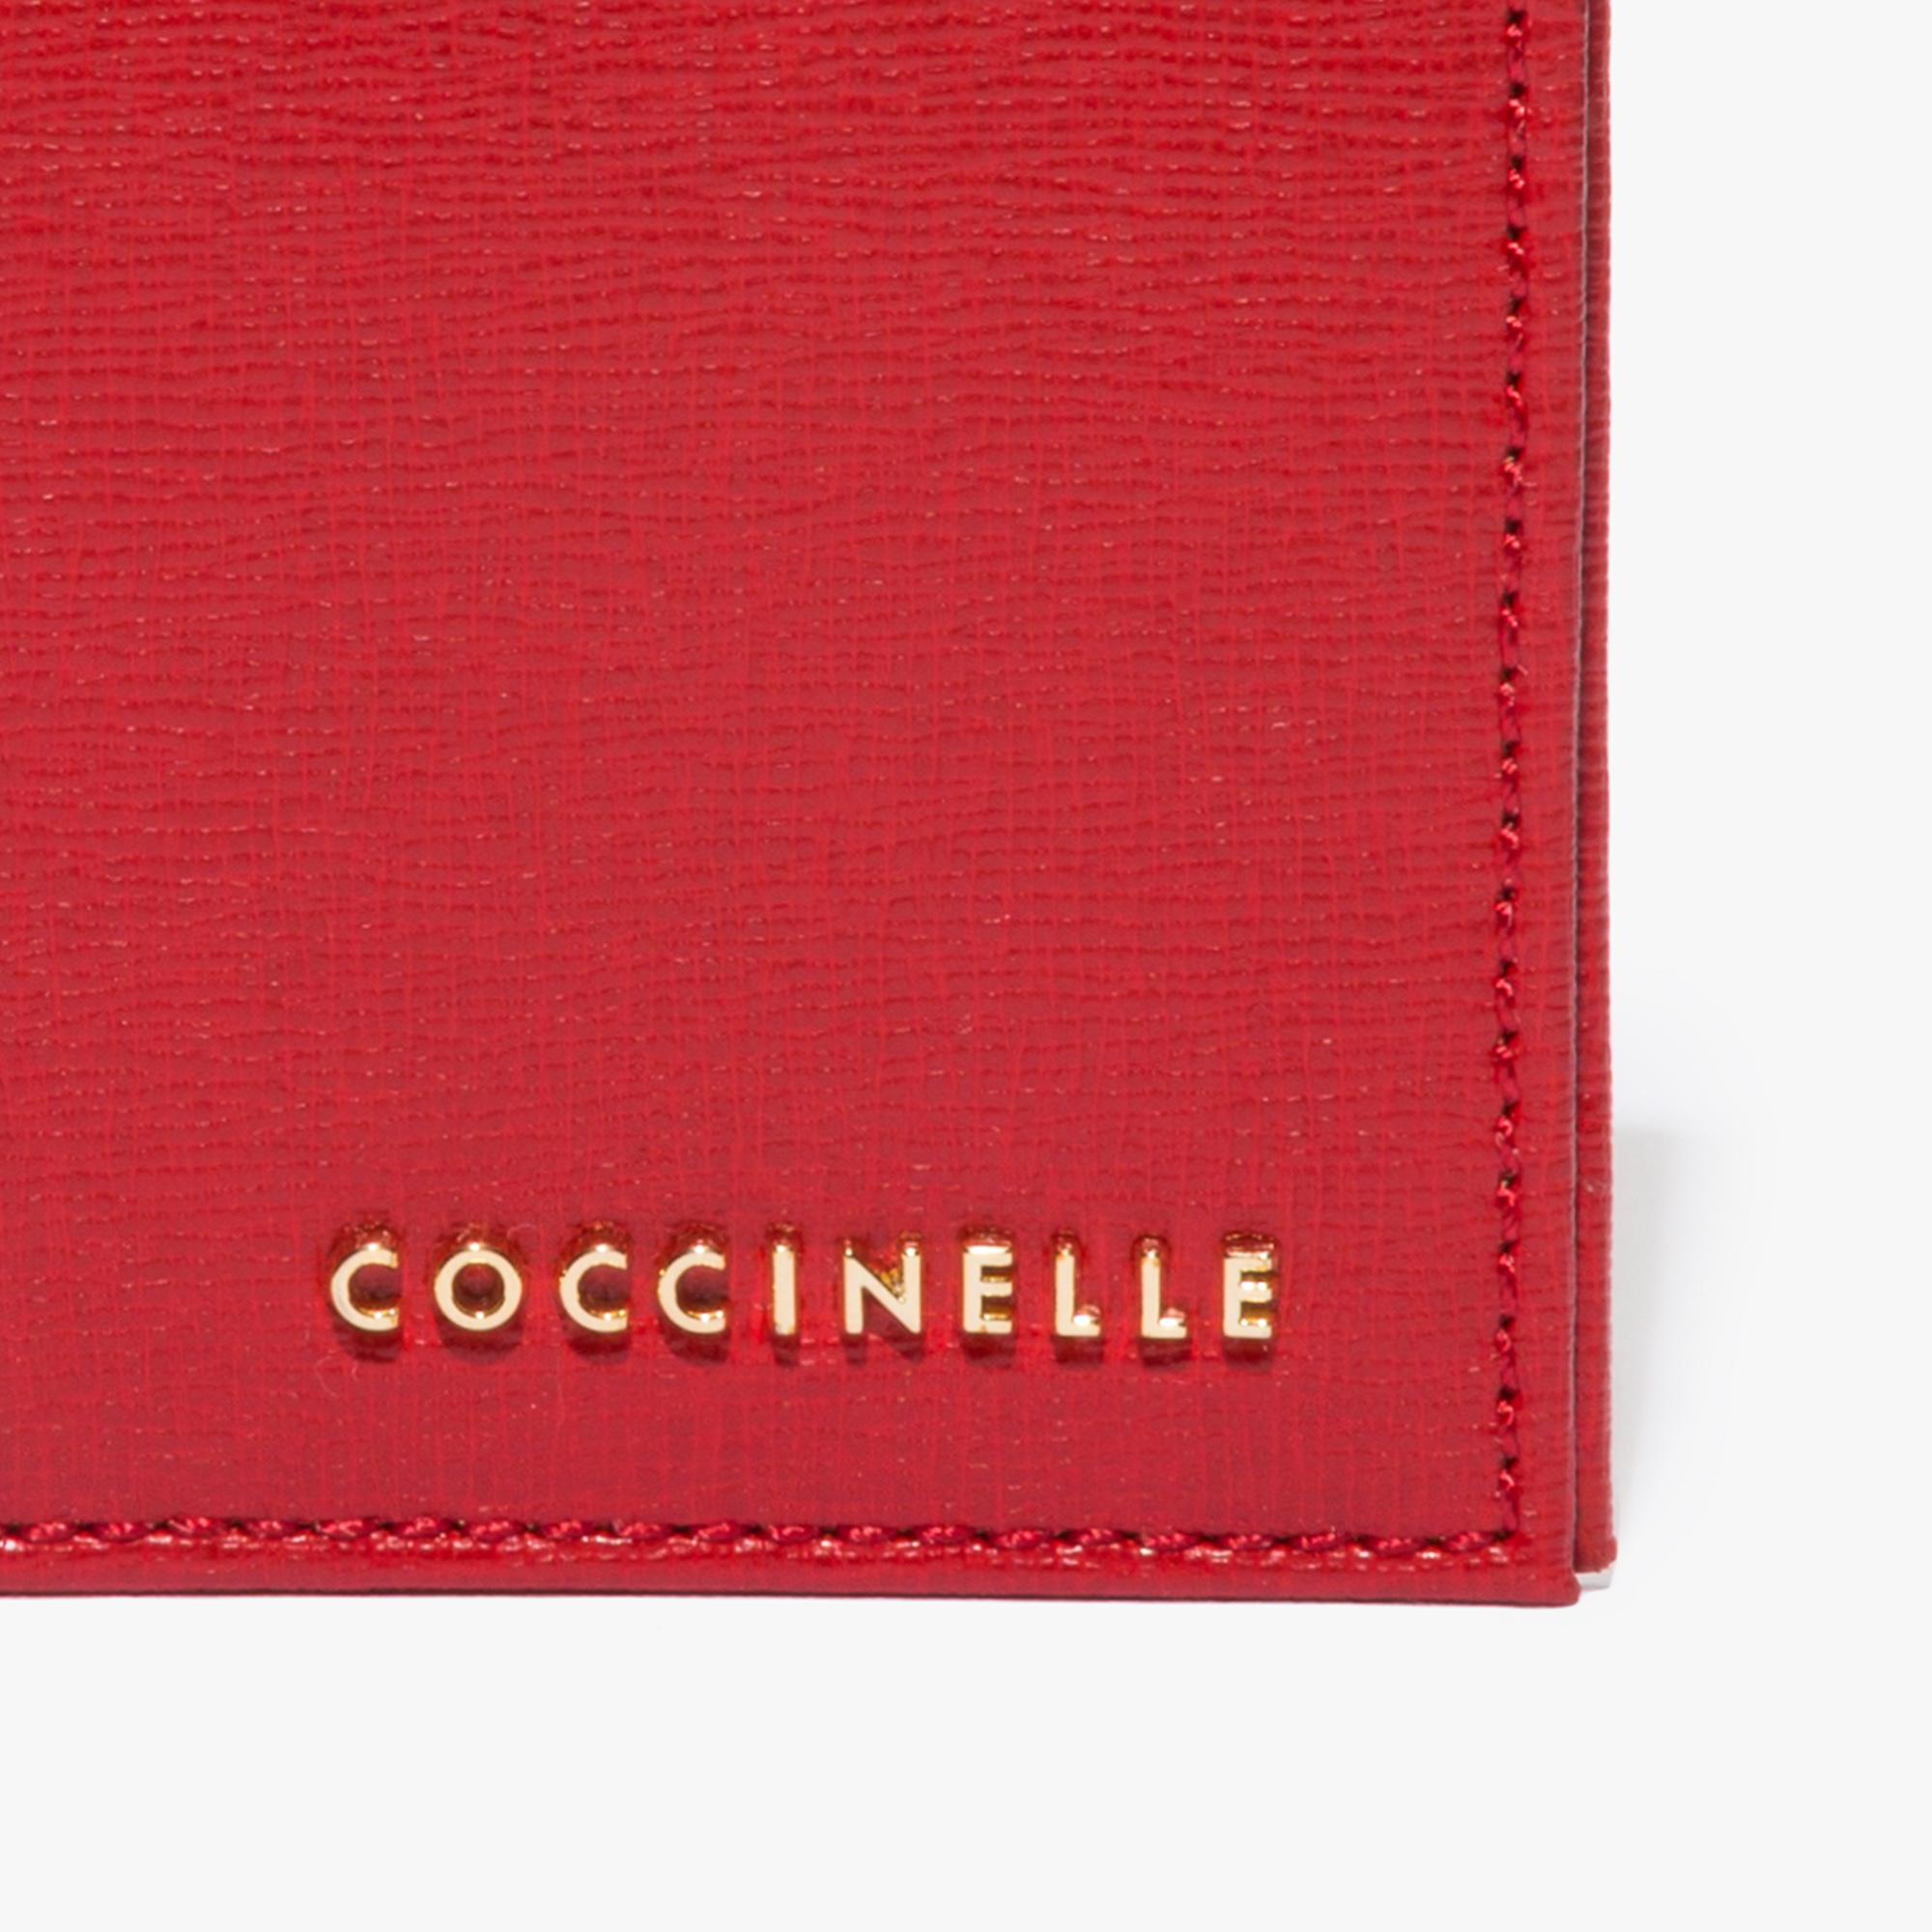 Coccinelle Saffiano document holder